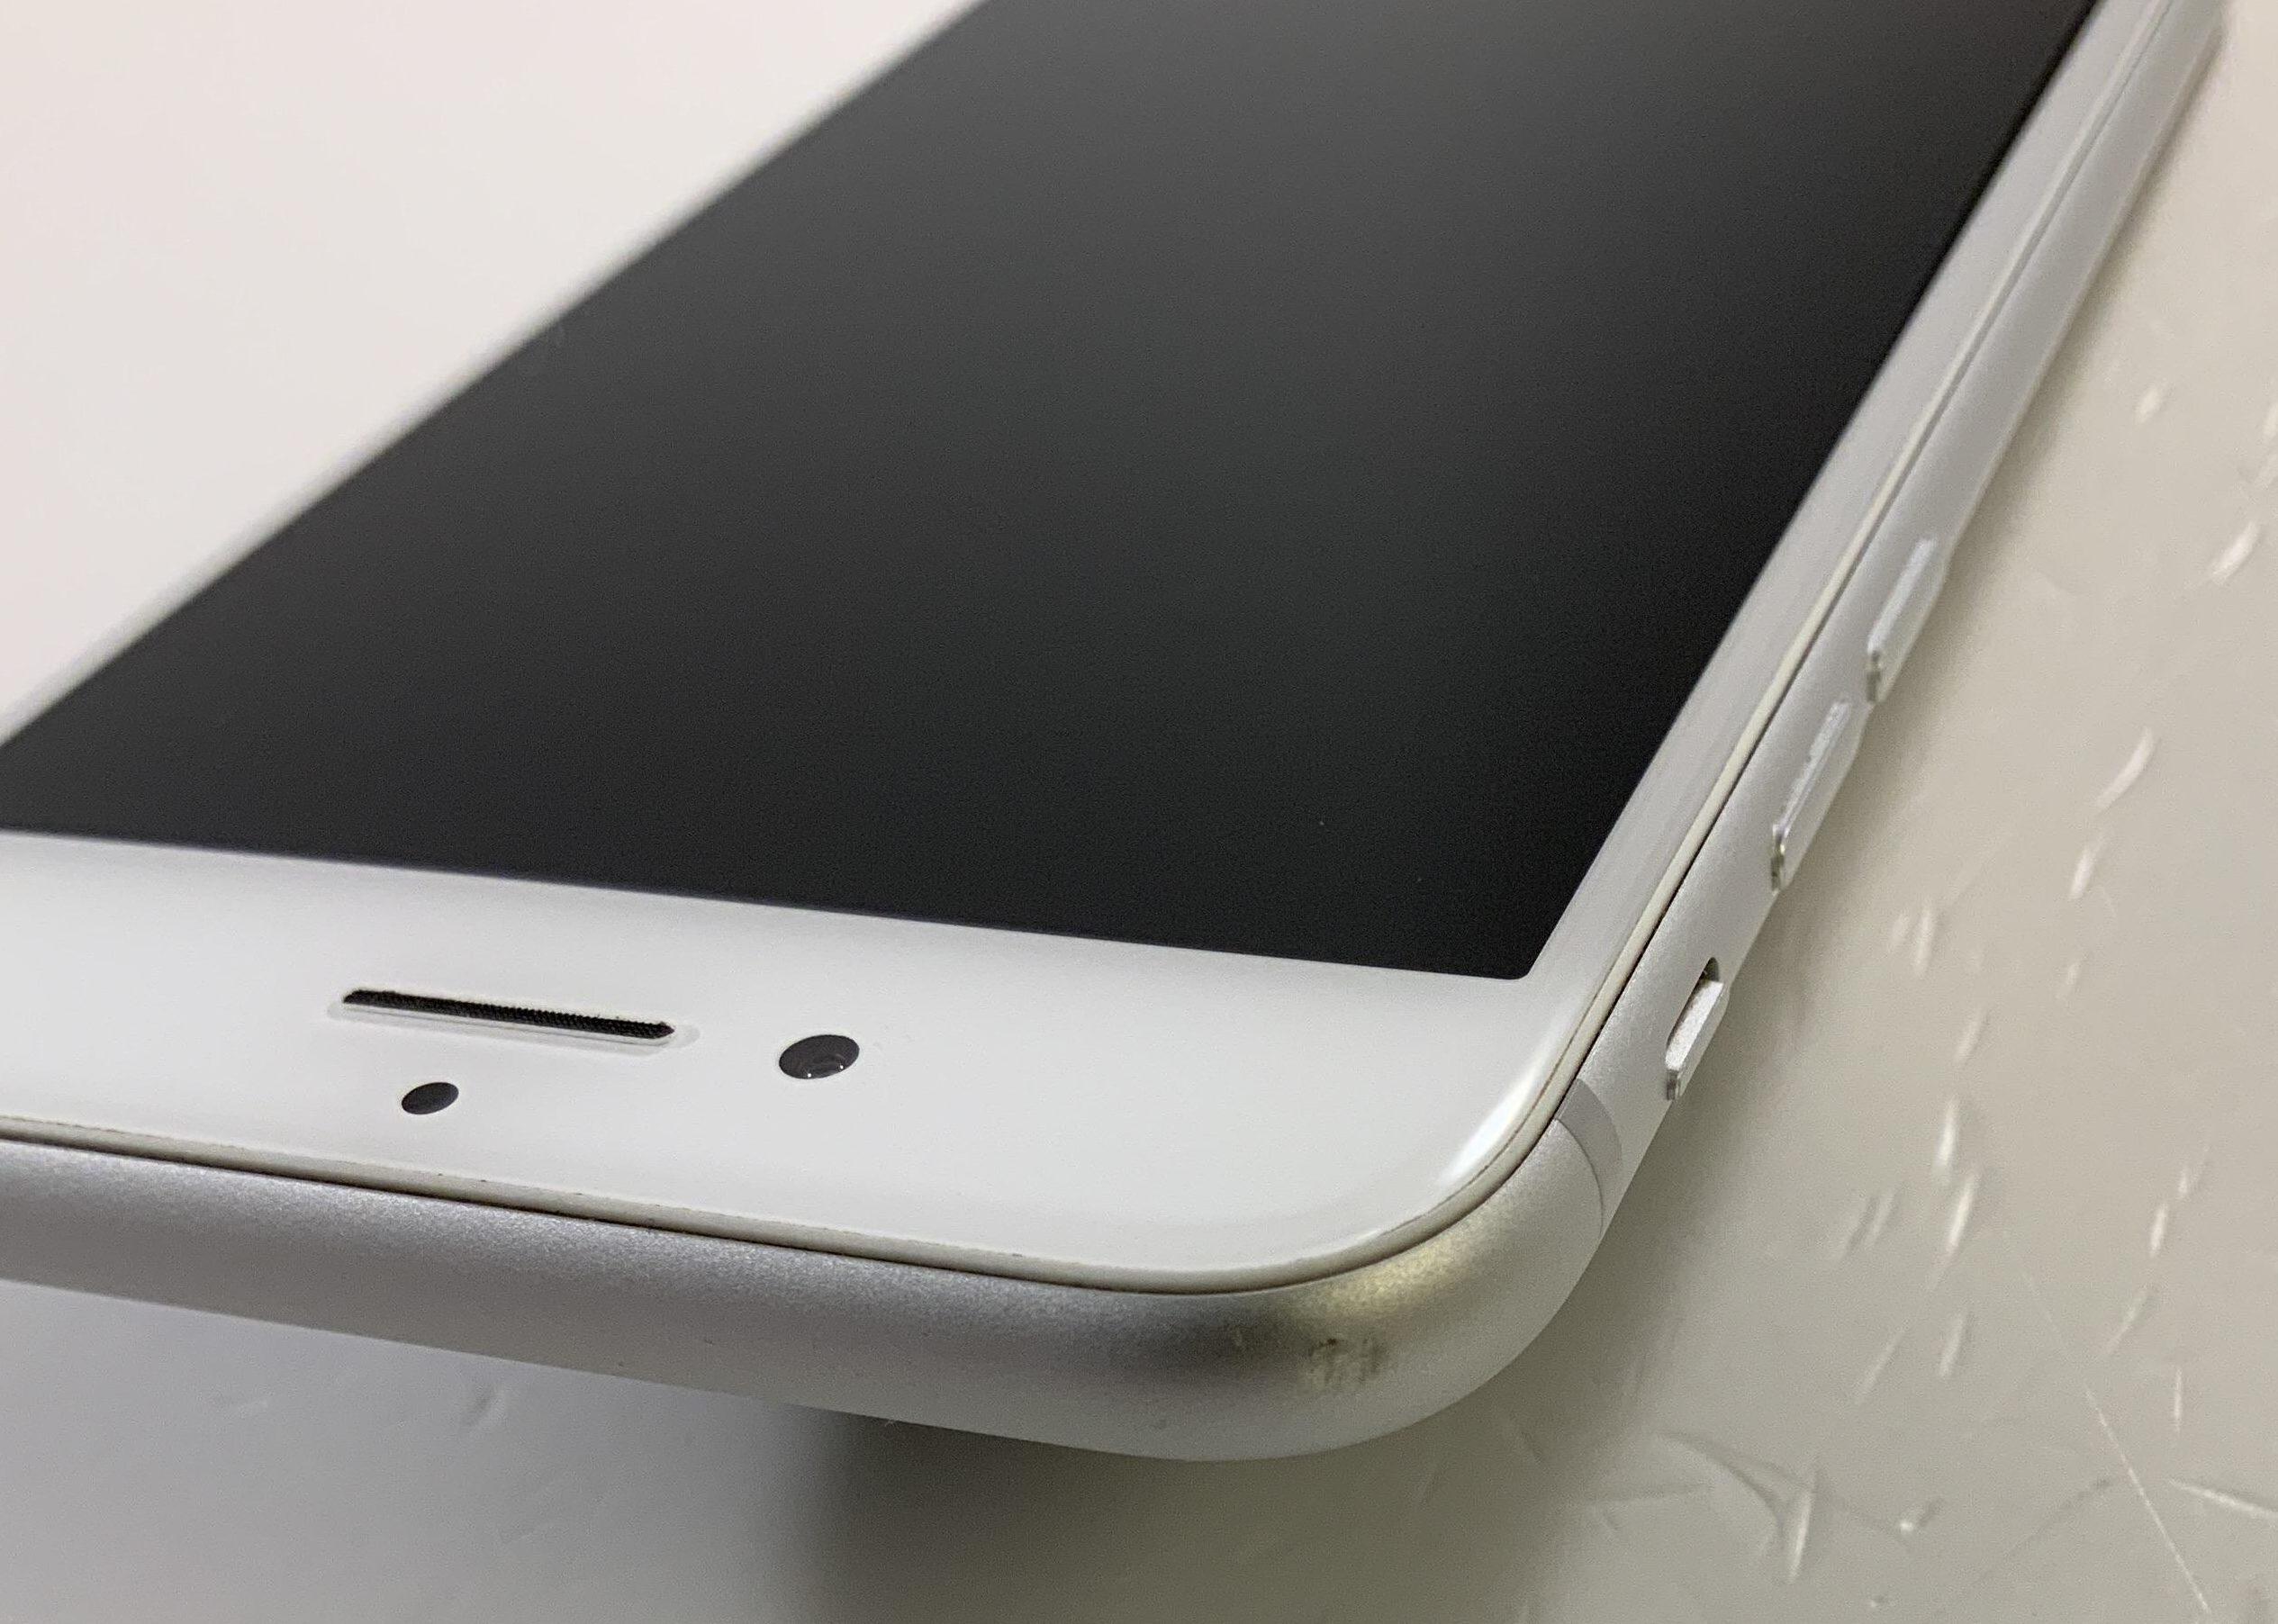 iPhone 8 64GB, 64GB, Silver, Afbeelding 3